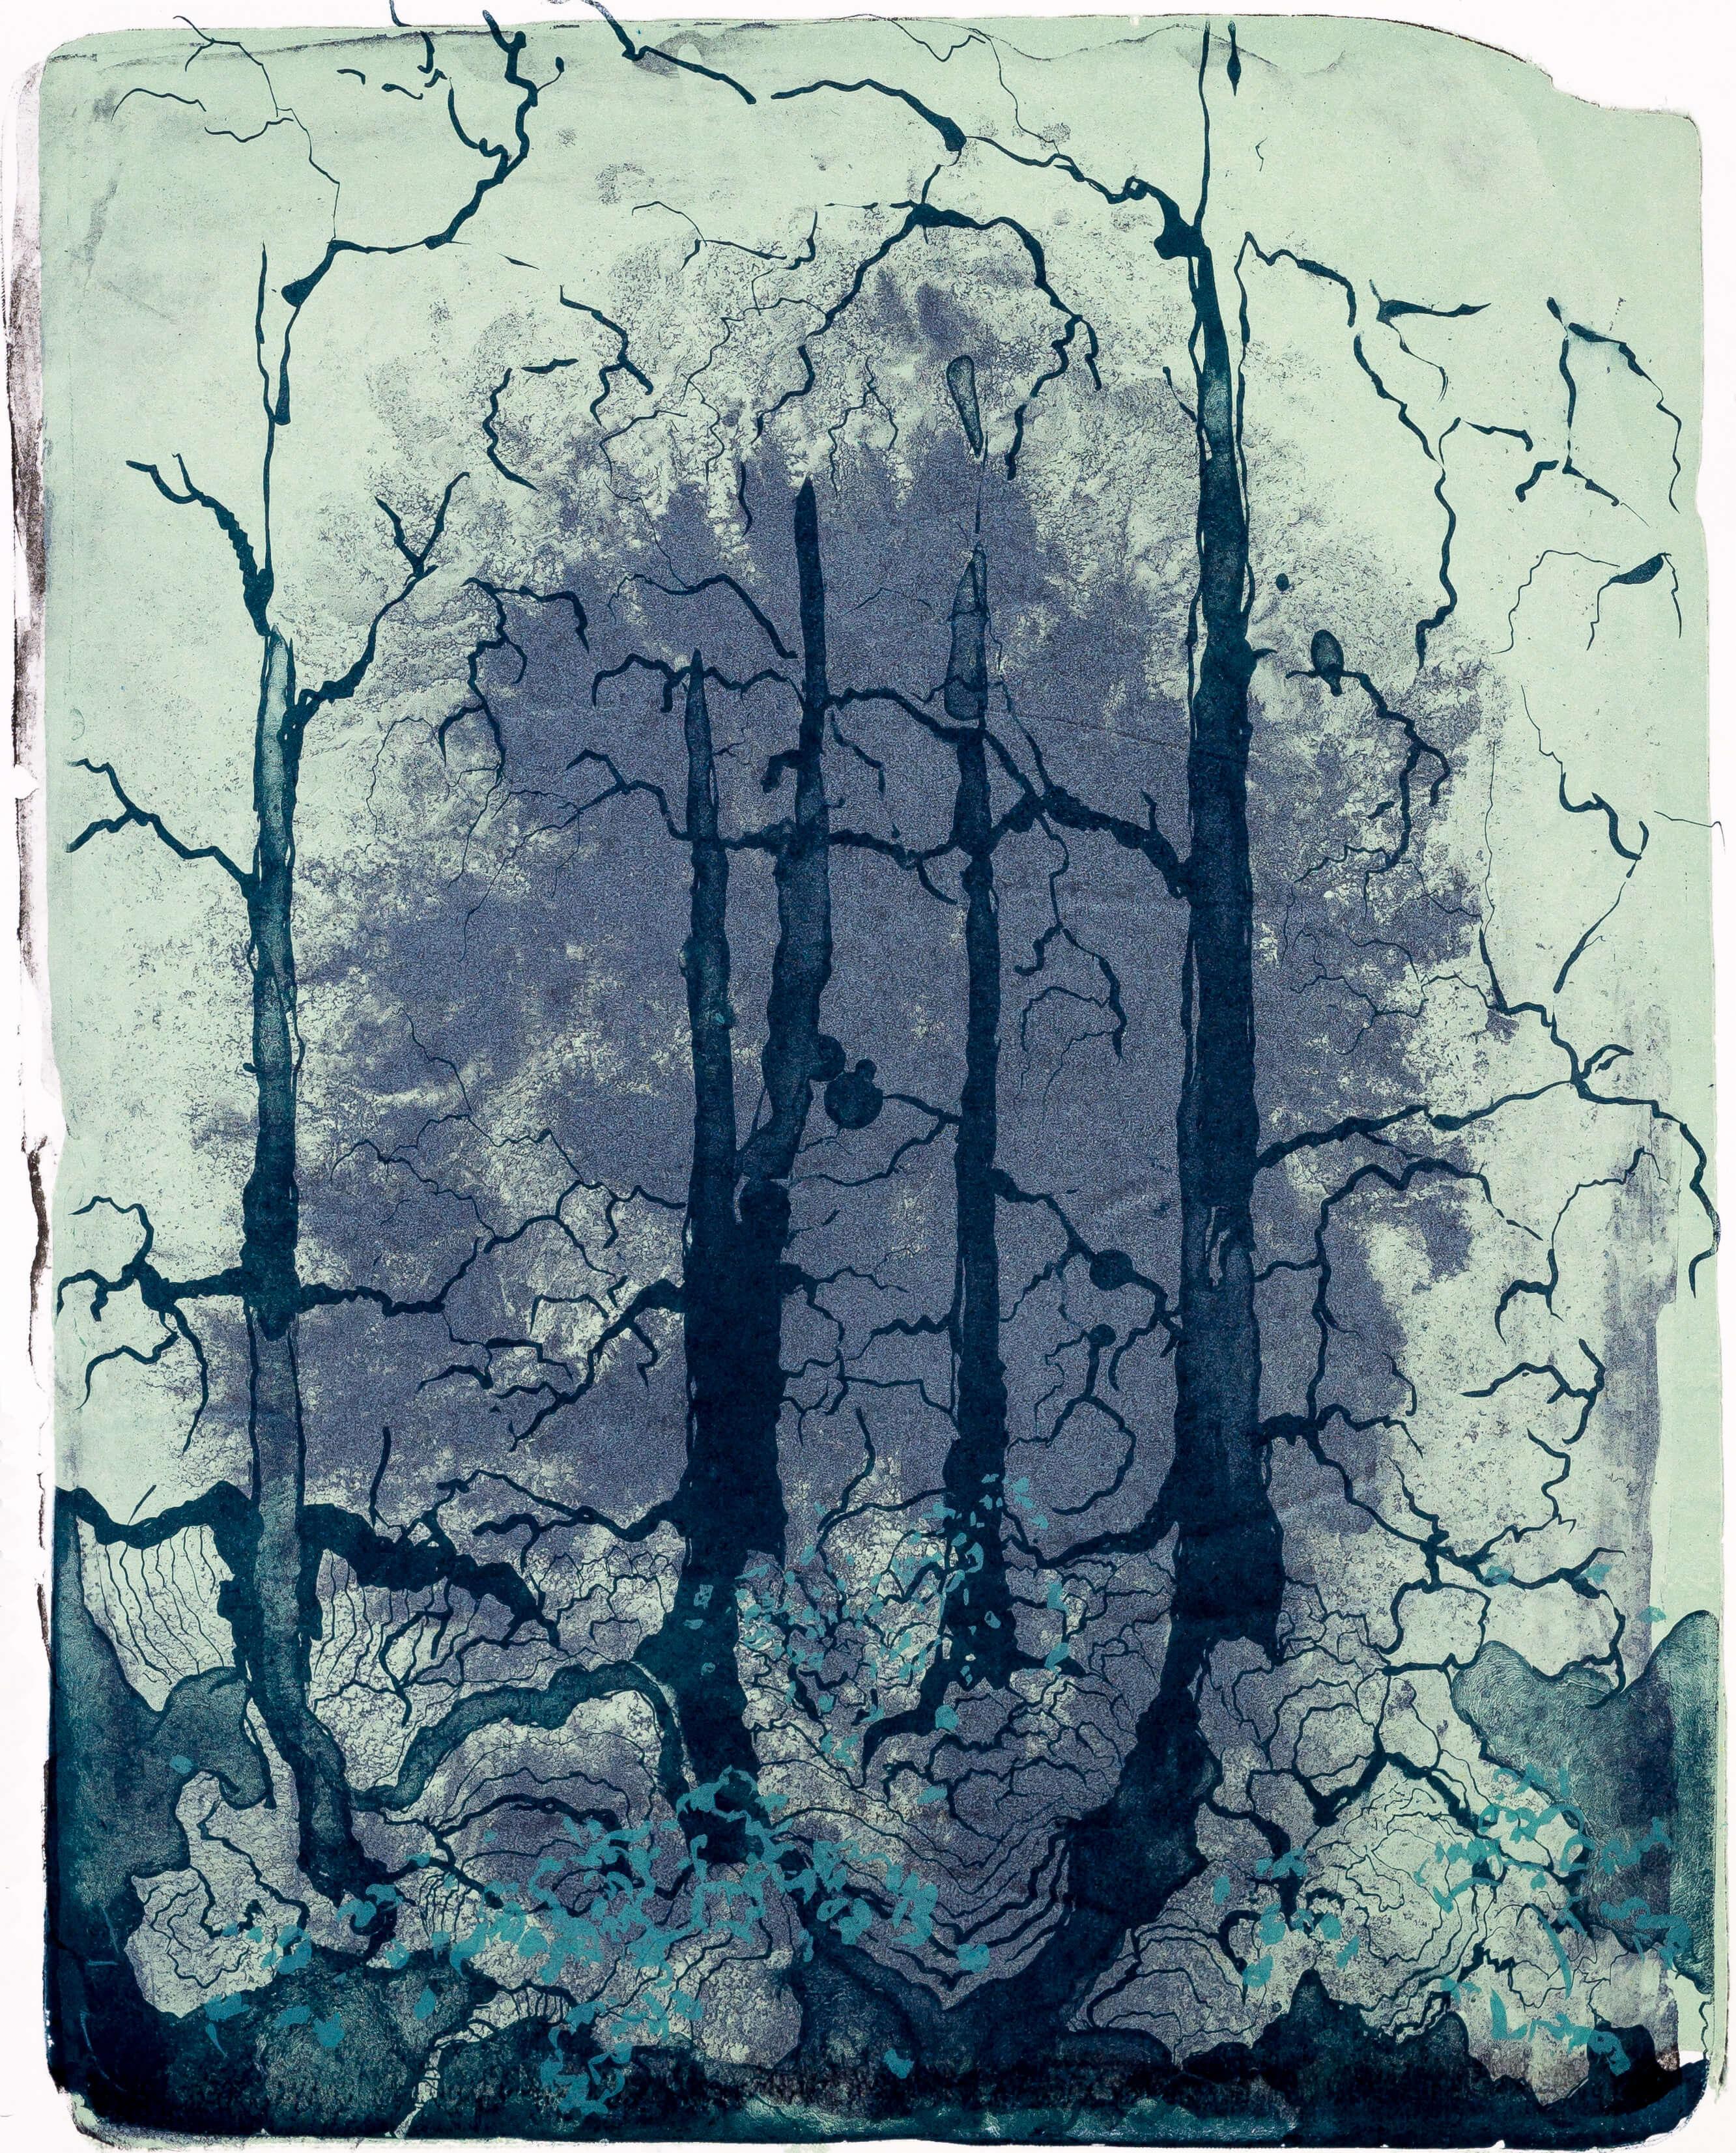 Katharina Albers, organism (Wald) III, 2016, Farblithographie, Unikat, 50x40 cm